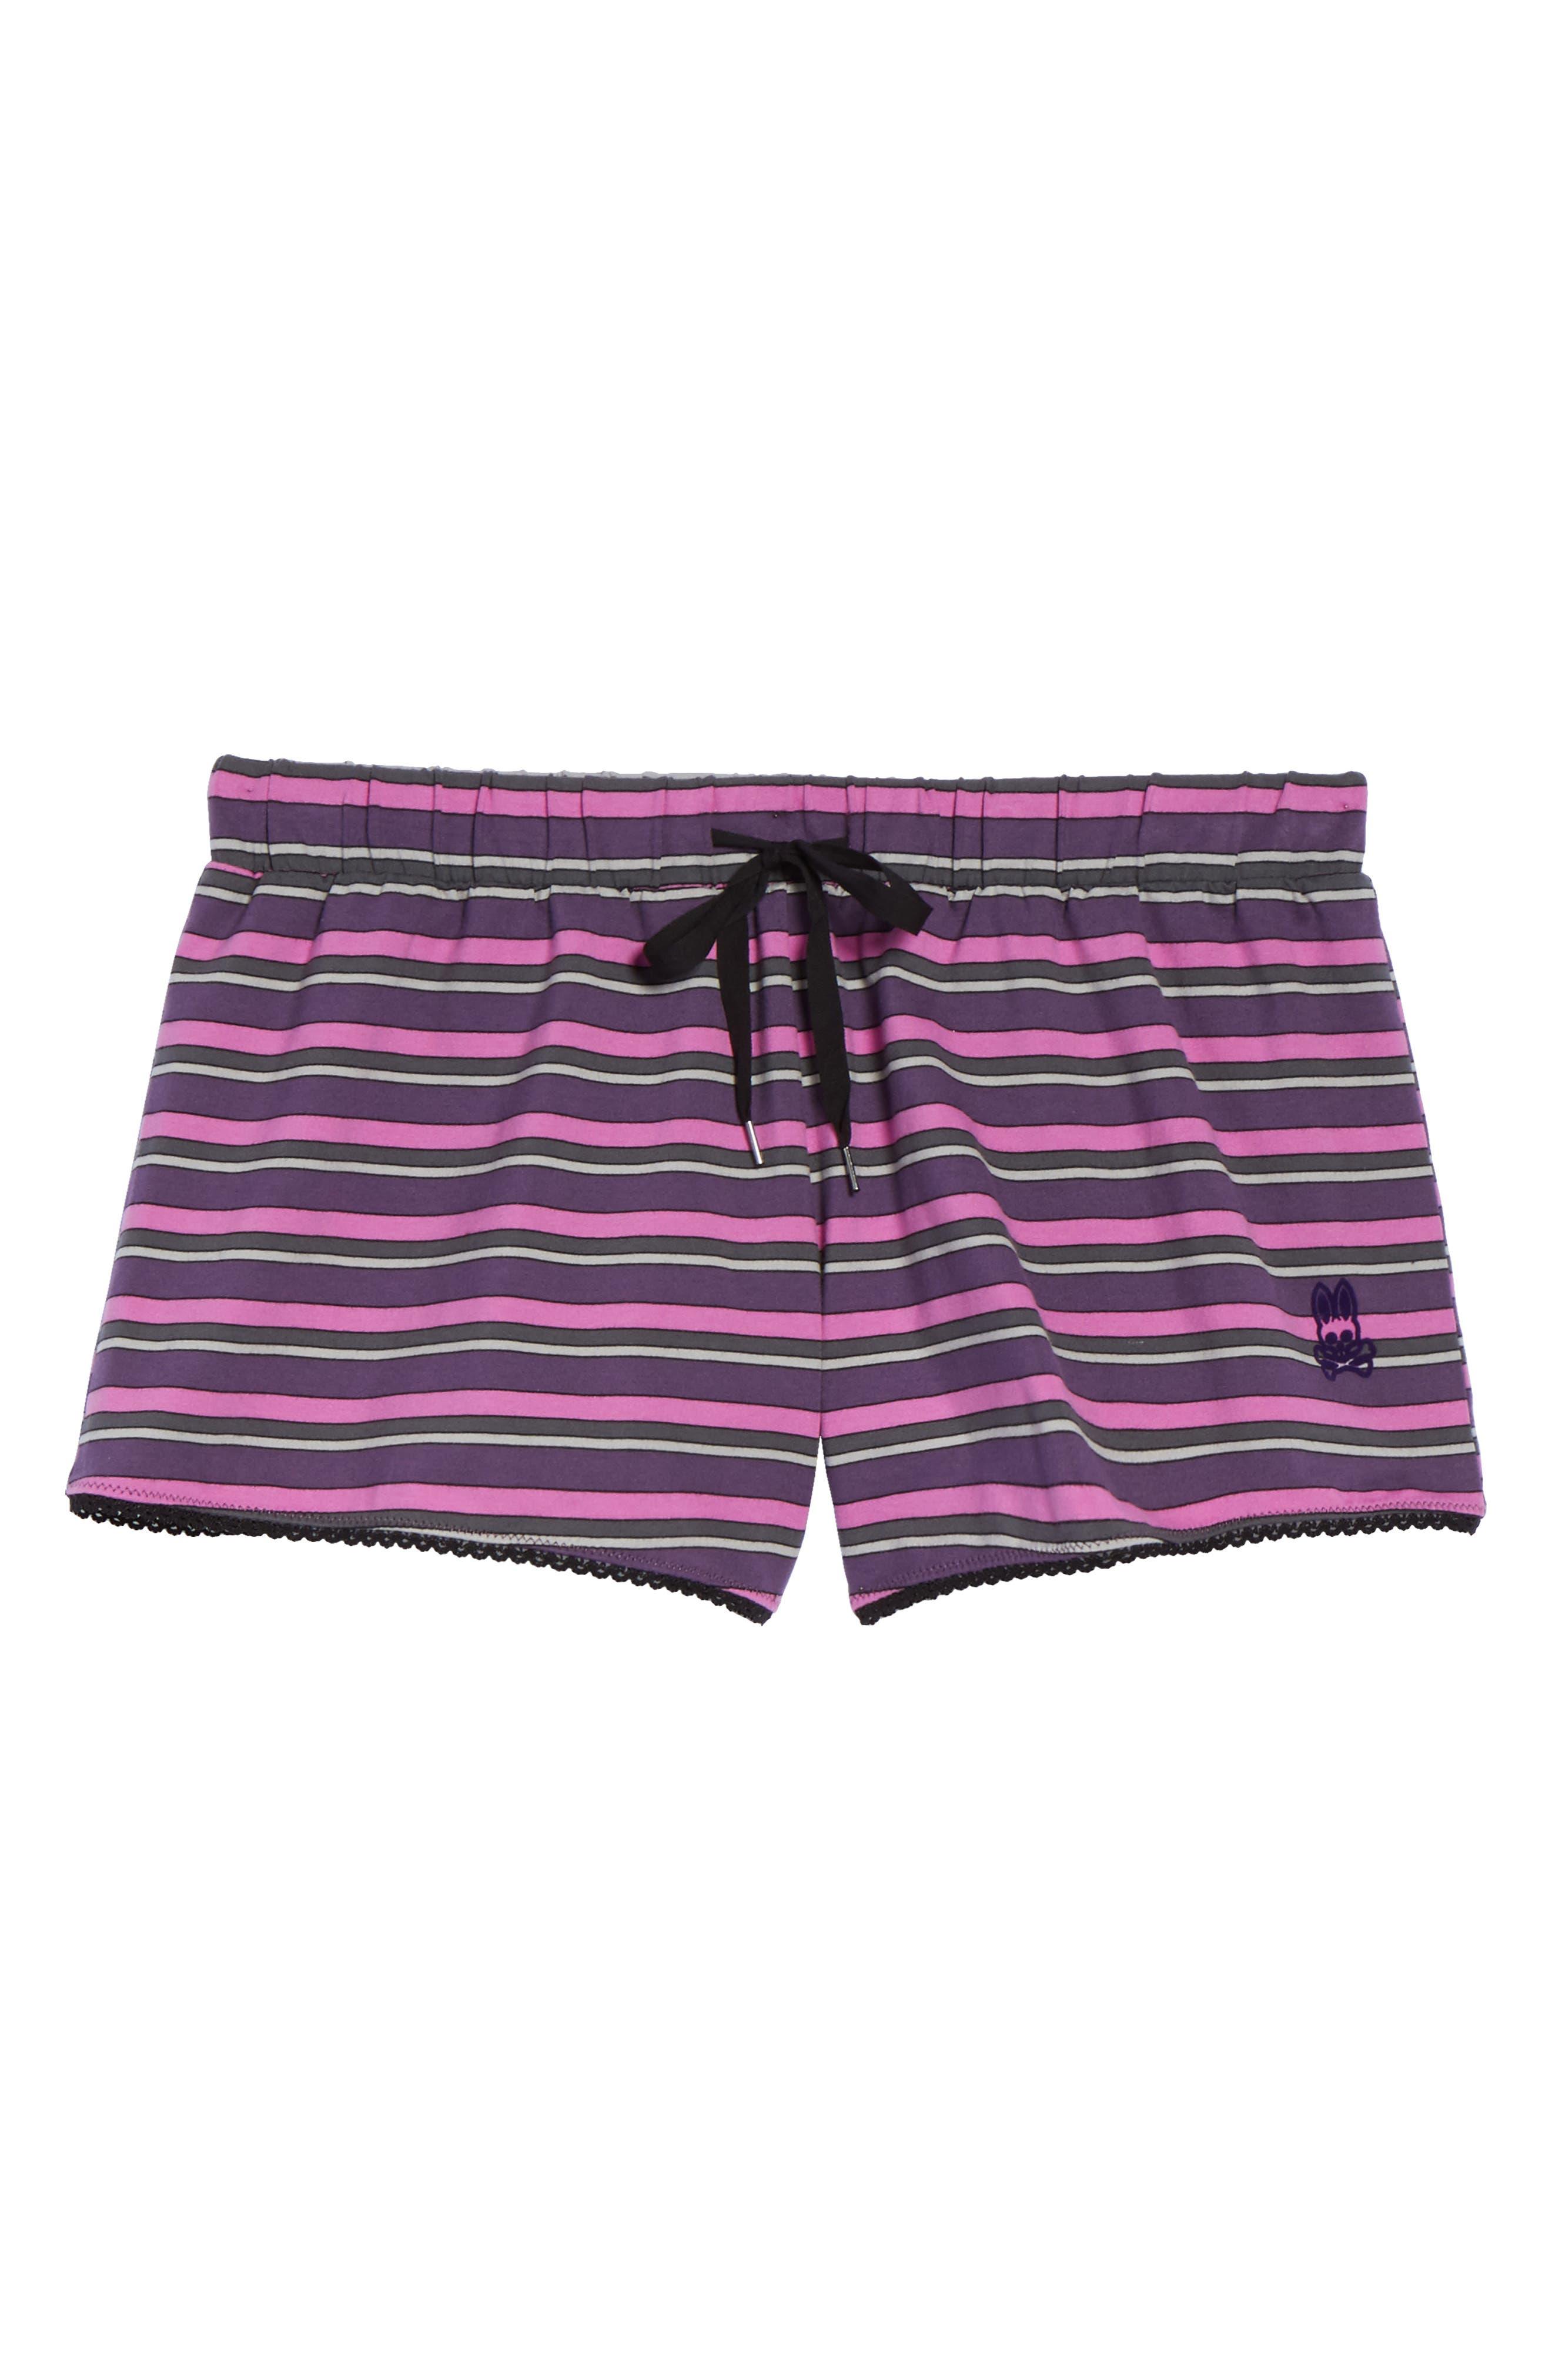 Pajama Shorts,                             Alternate thumbnail 5, color,                             Currant Stripe